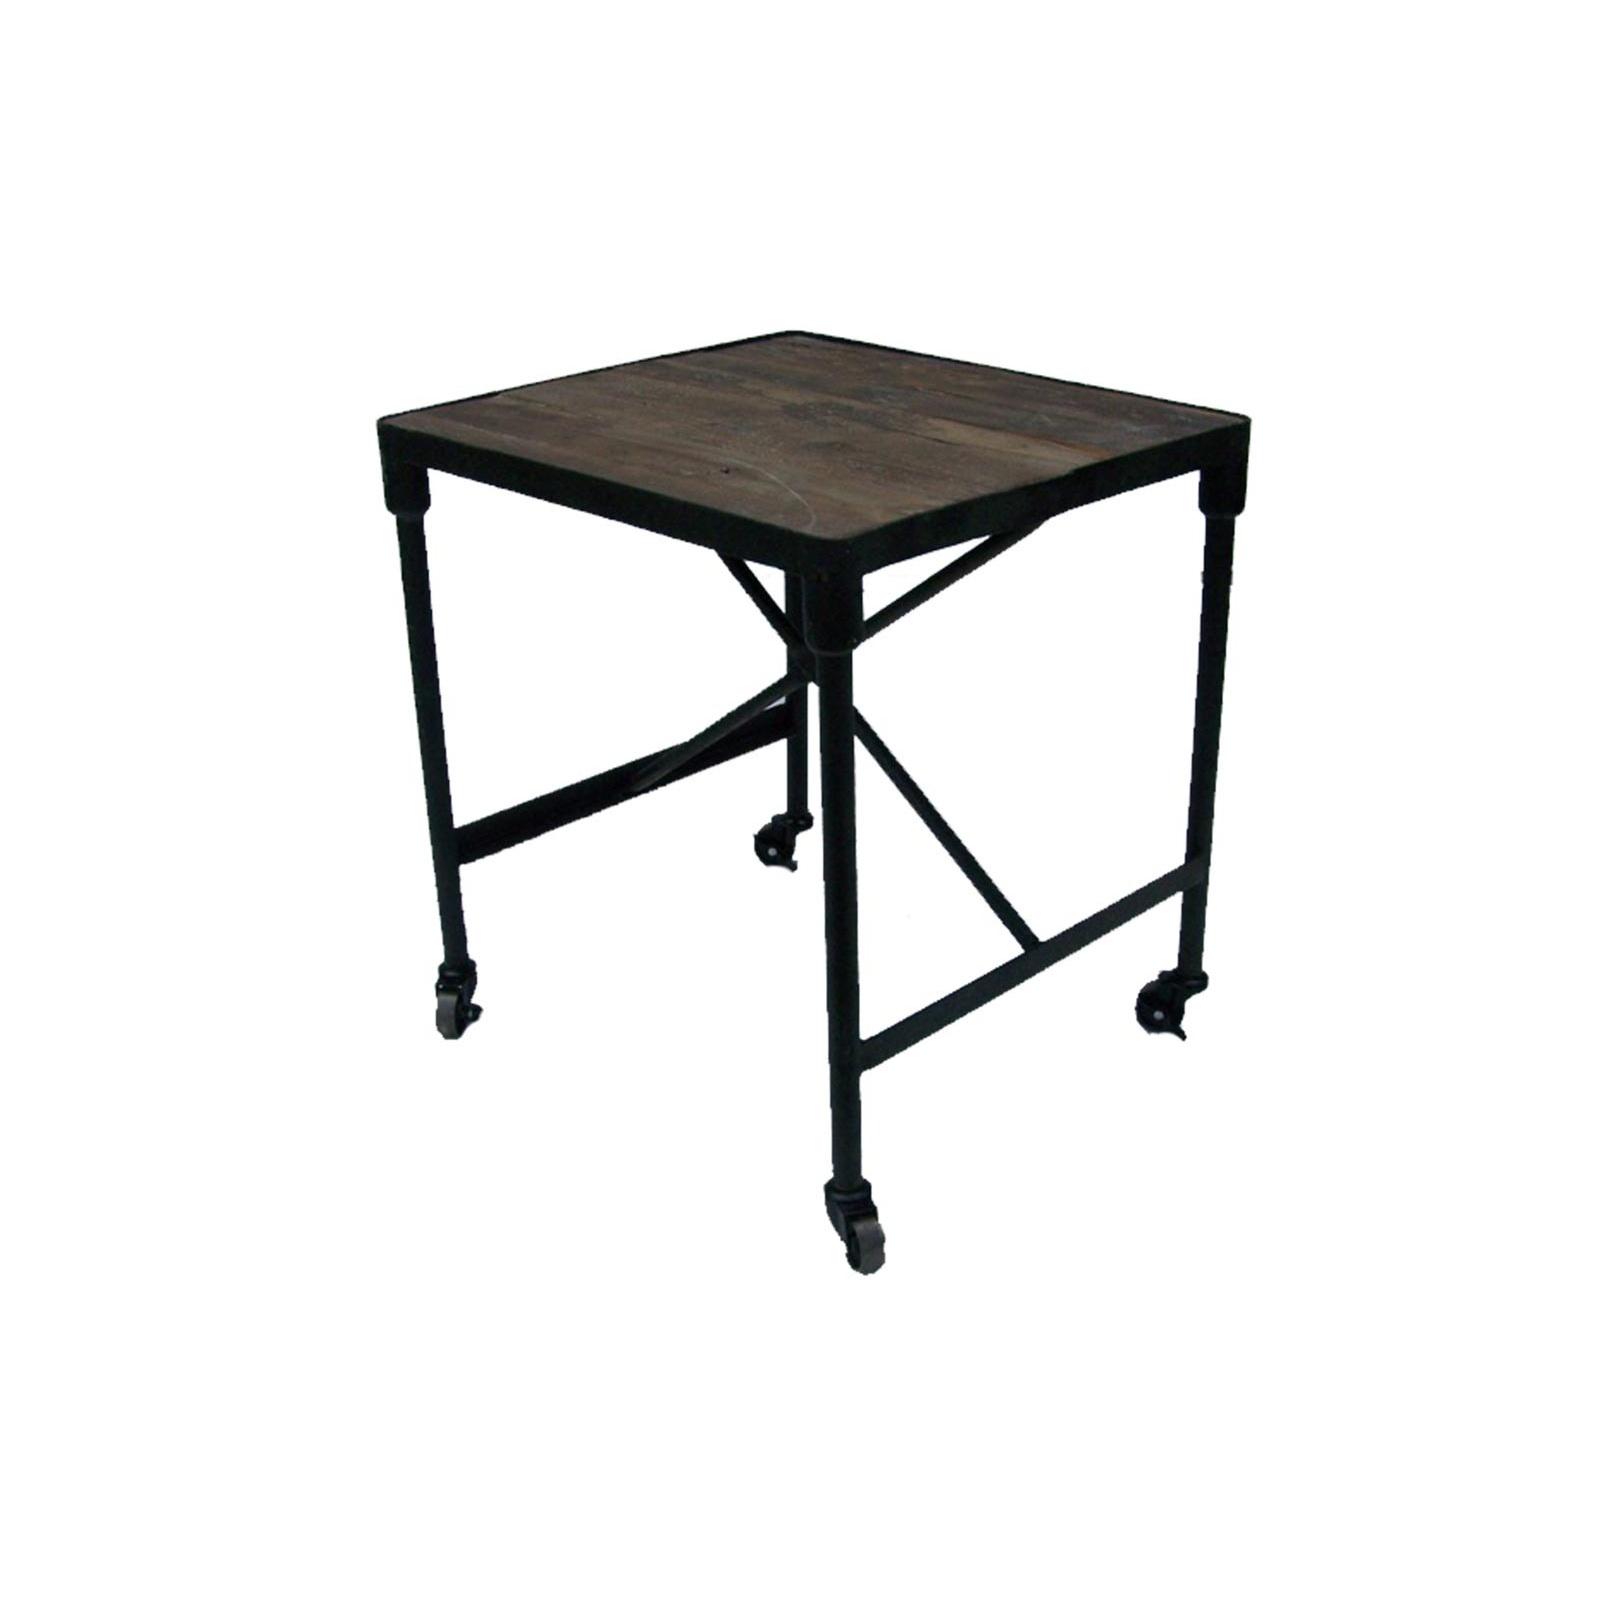 bout de canap industriel jp2b d coration. Black Bedroom Furniture Sets. Home Design Ideas